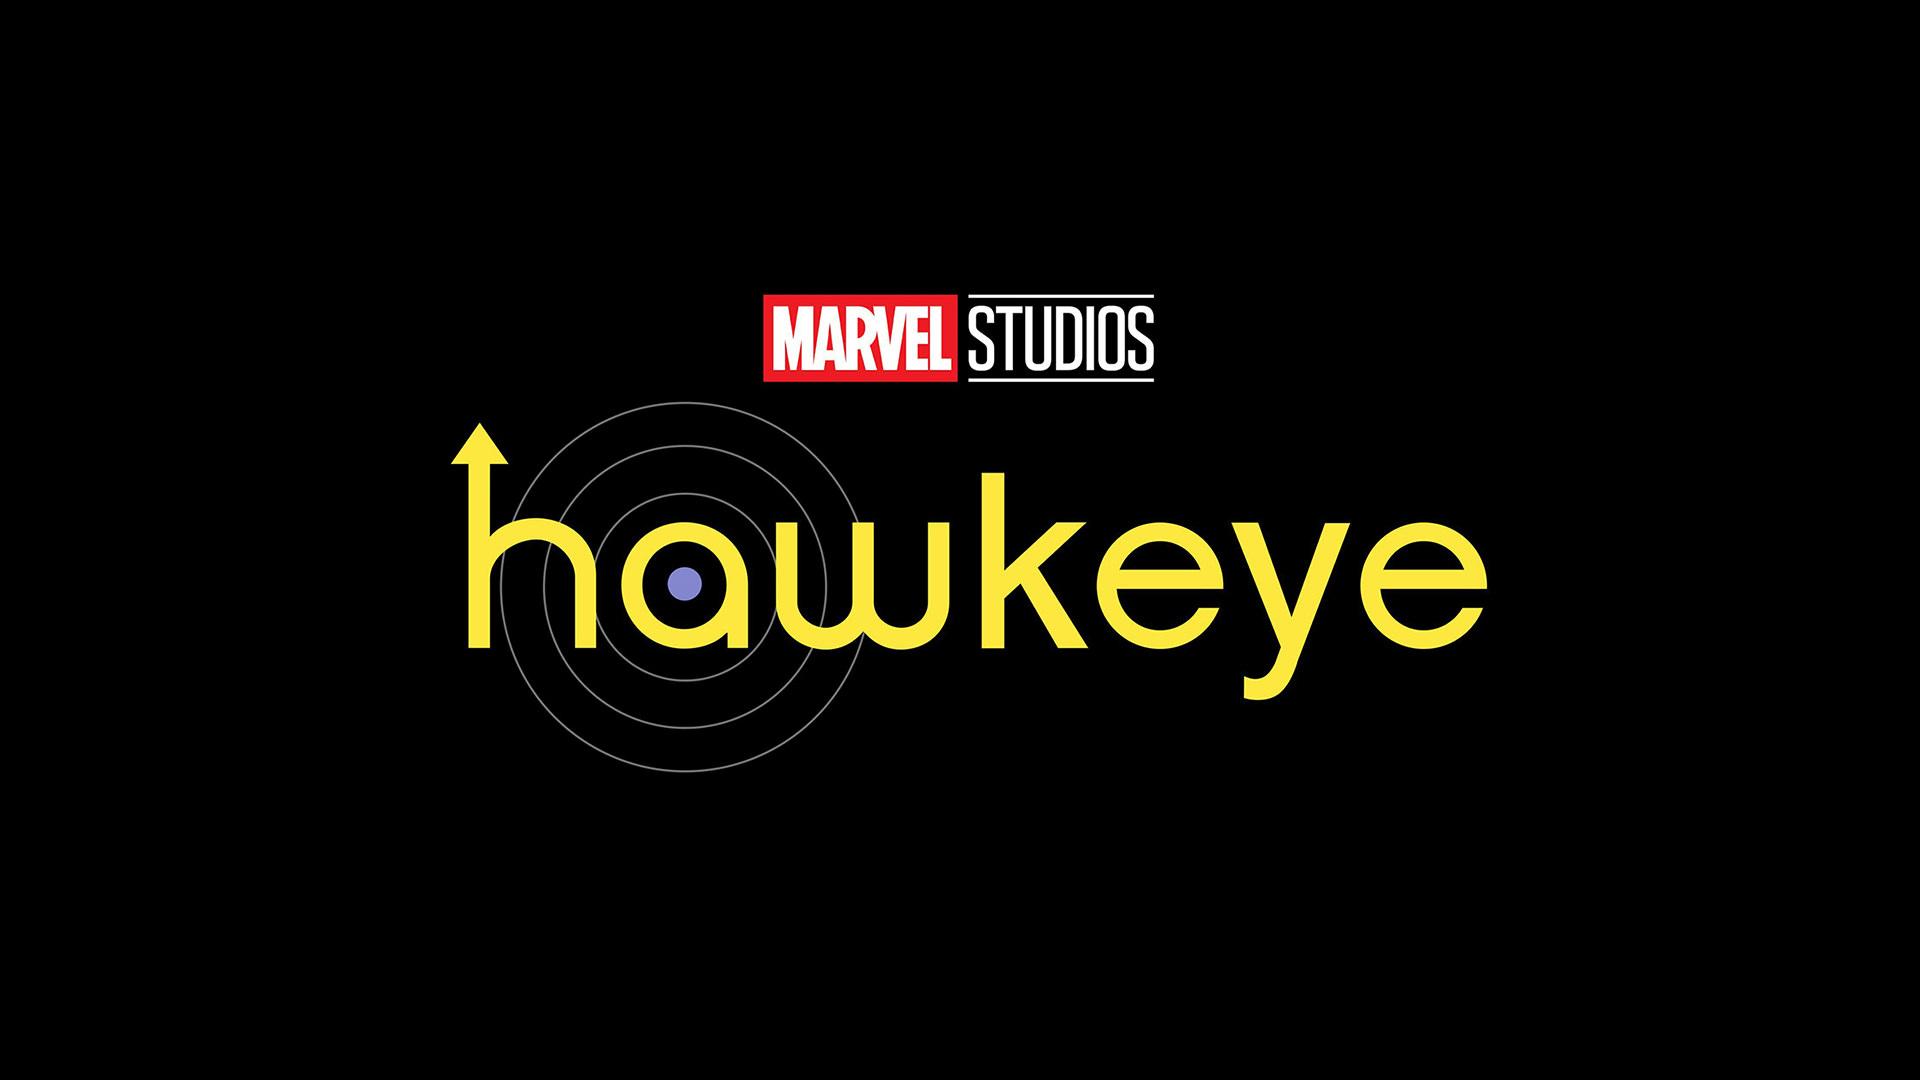 تصاویر جدید از پشت صحنه سریال Hawkeye کلینت بارتون و کیت بیشاپ را نشان میدهد